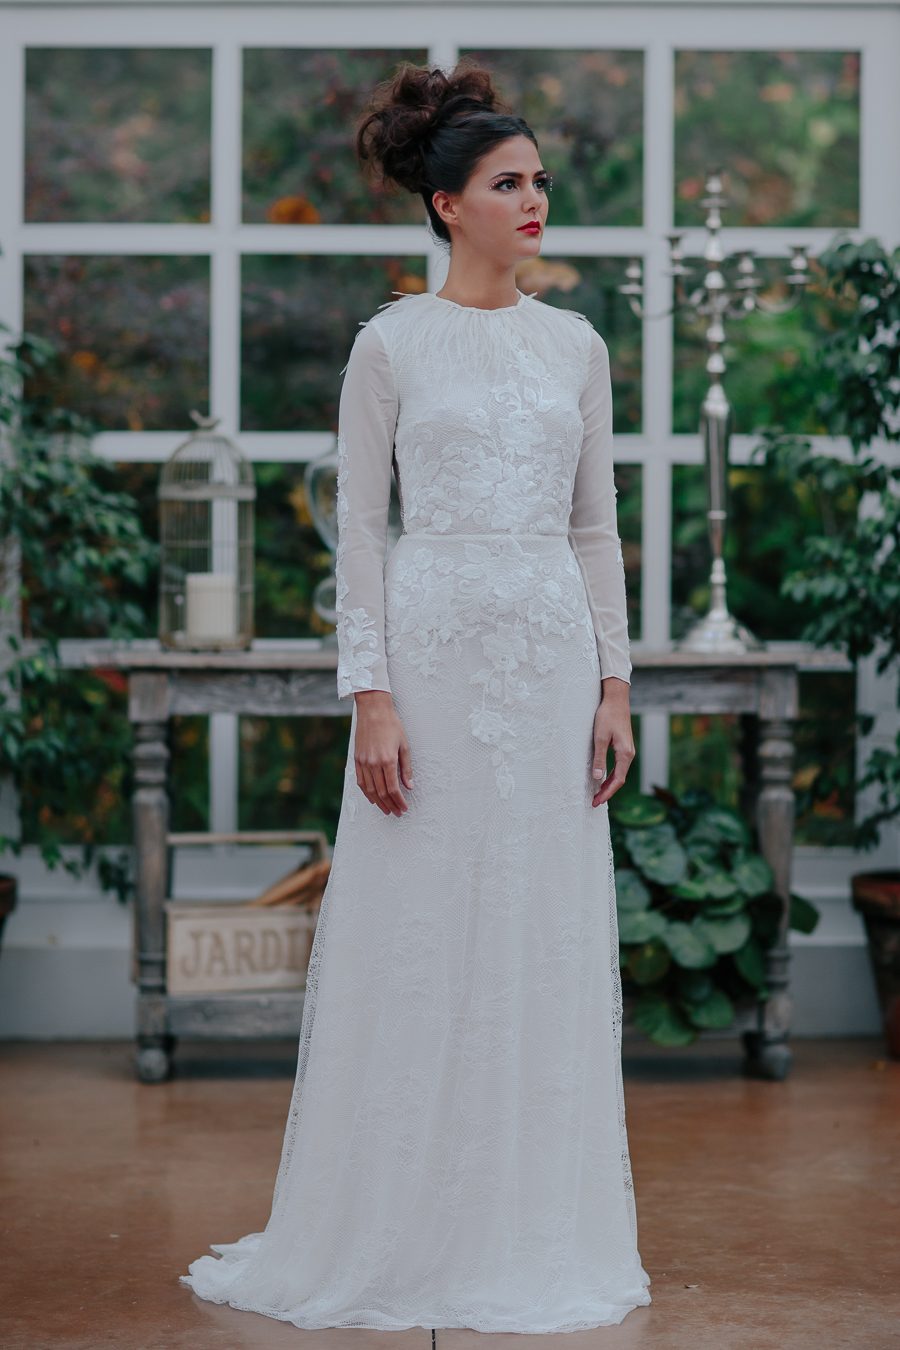 Unique Vestidos Novia Sevilla Photos - All Wedding Dresses ...